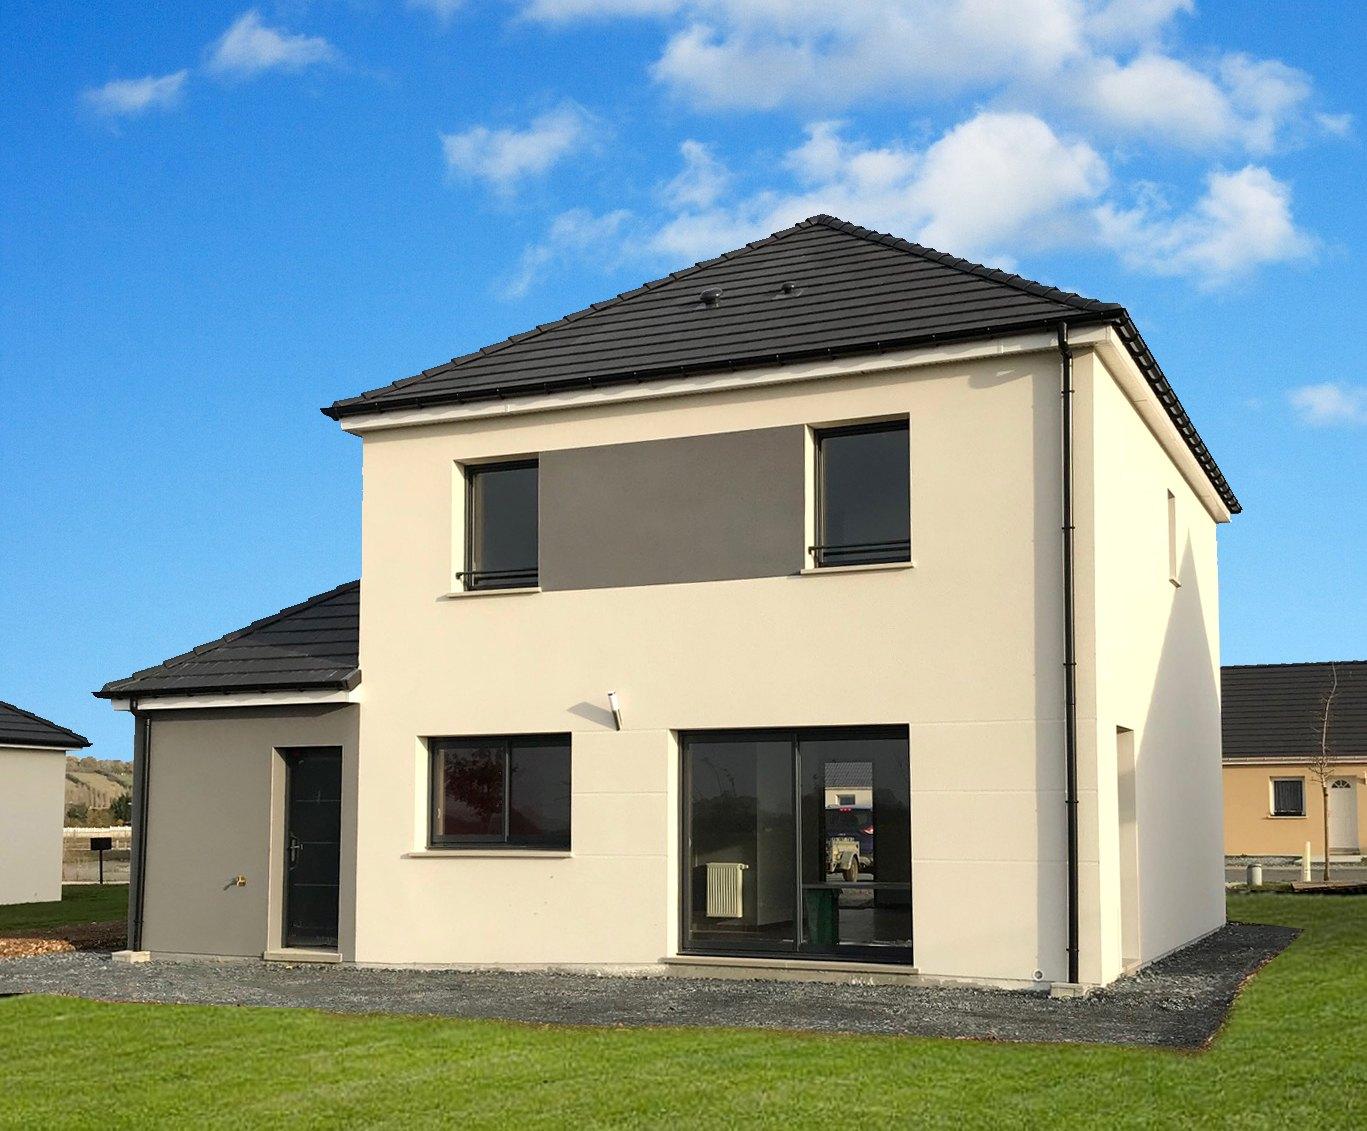 Maisons + Terrains du constructeur CASTOR MESNIL ESNARD • 110 m² • CRITOT